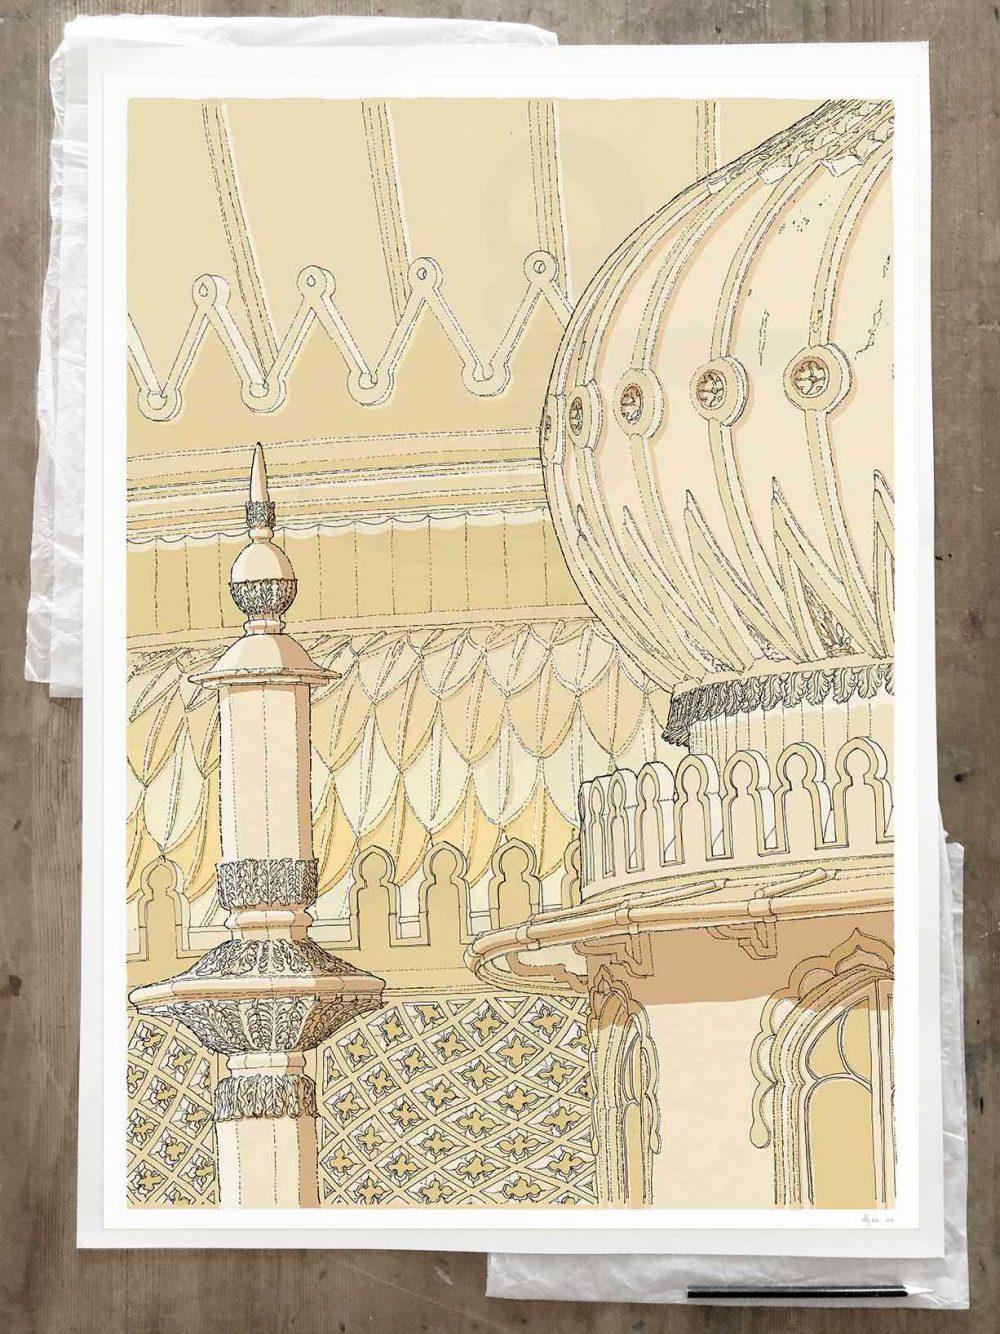 Fine art print by artist alej ez titled Brighton Pavilion Finial and Domes Pearl